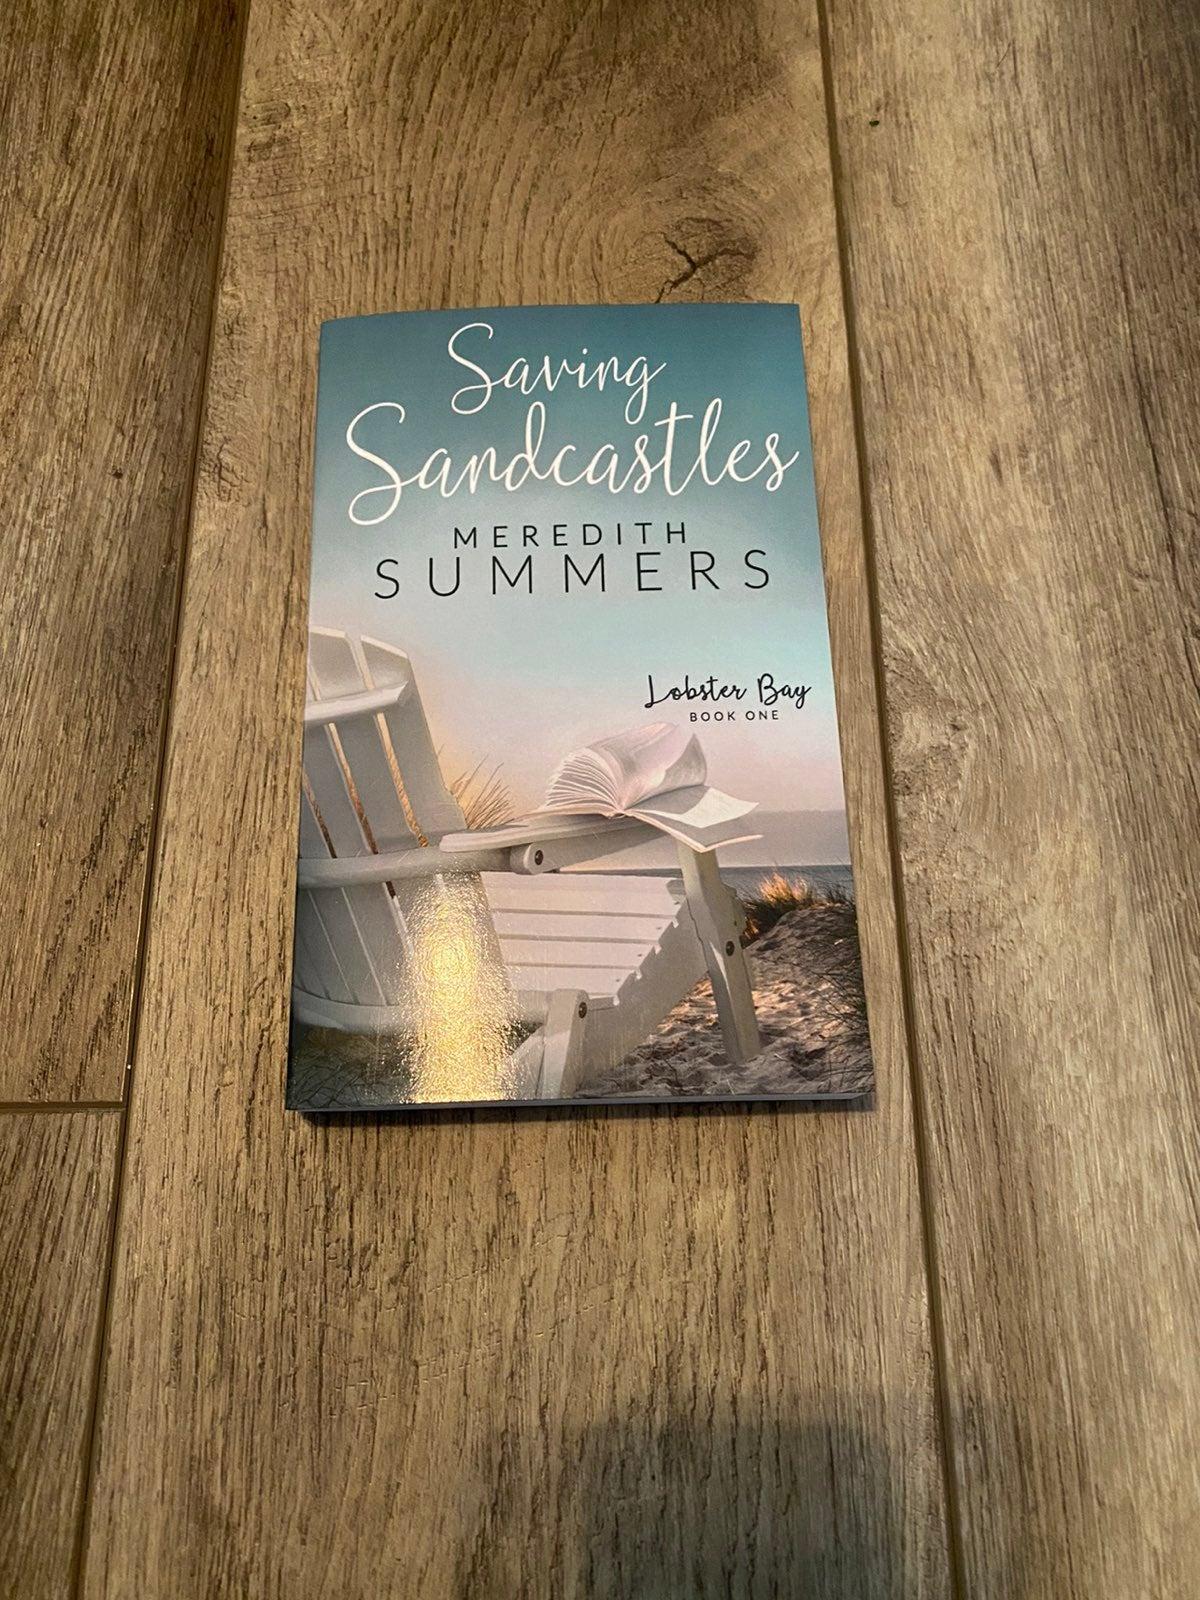 Saving Sandcastles Meredith Summers